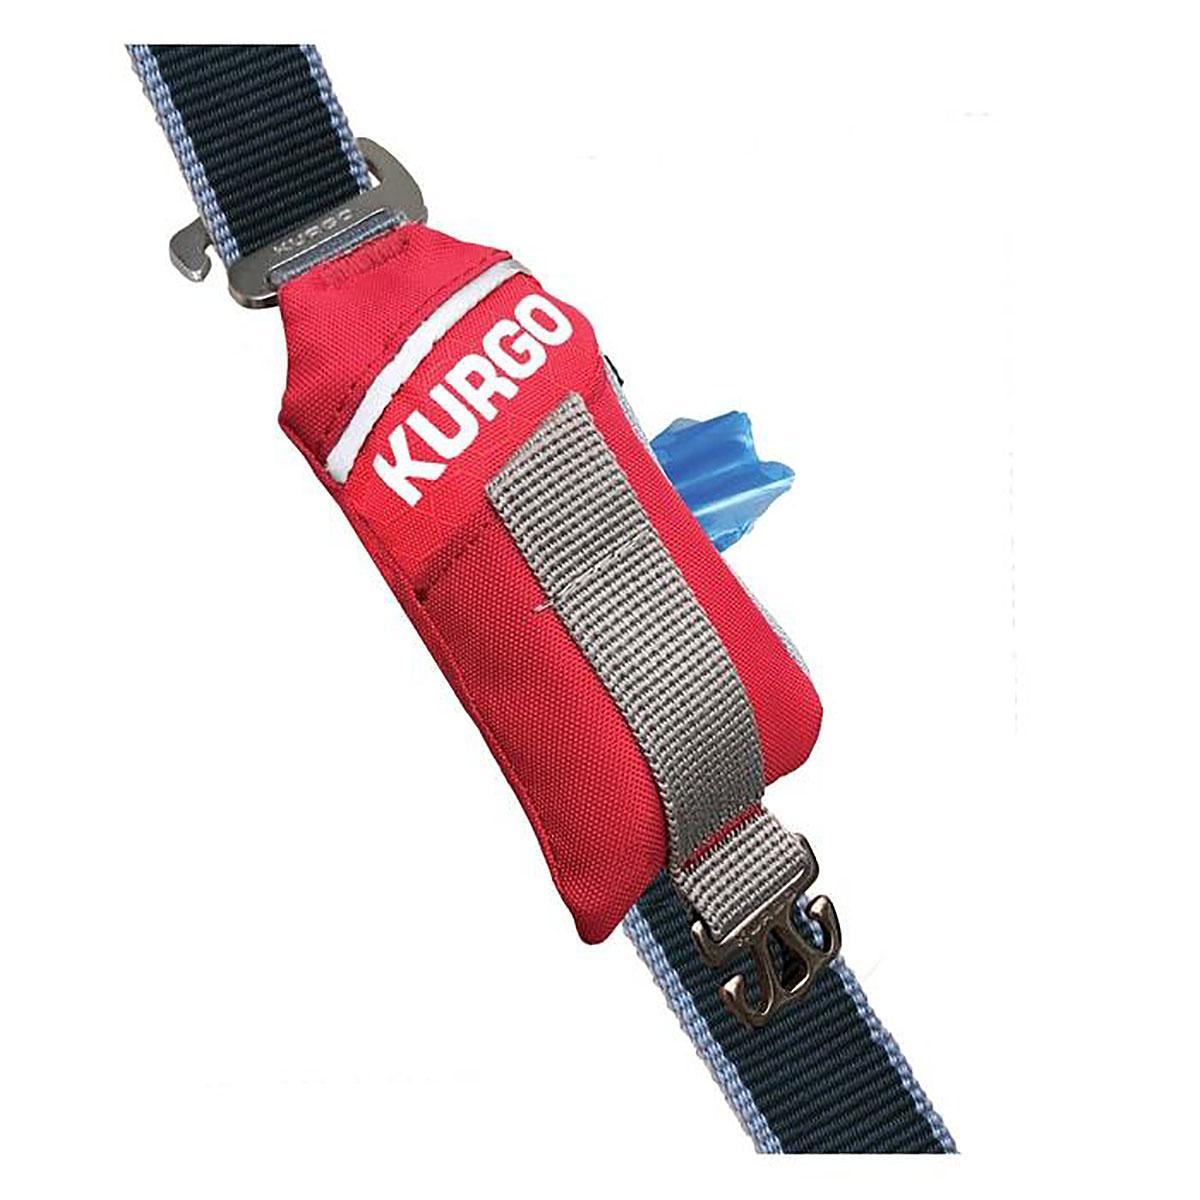 Kurgo Duty Bag - Dog Poop Bag Dispenser for Leashes